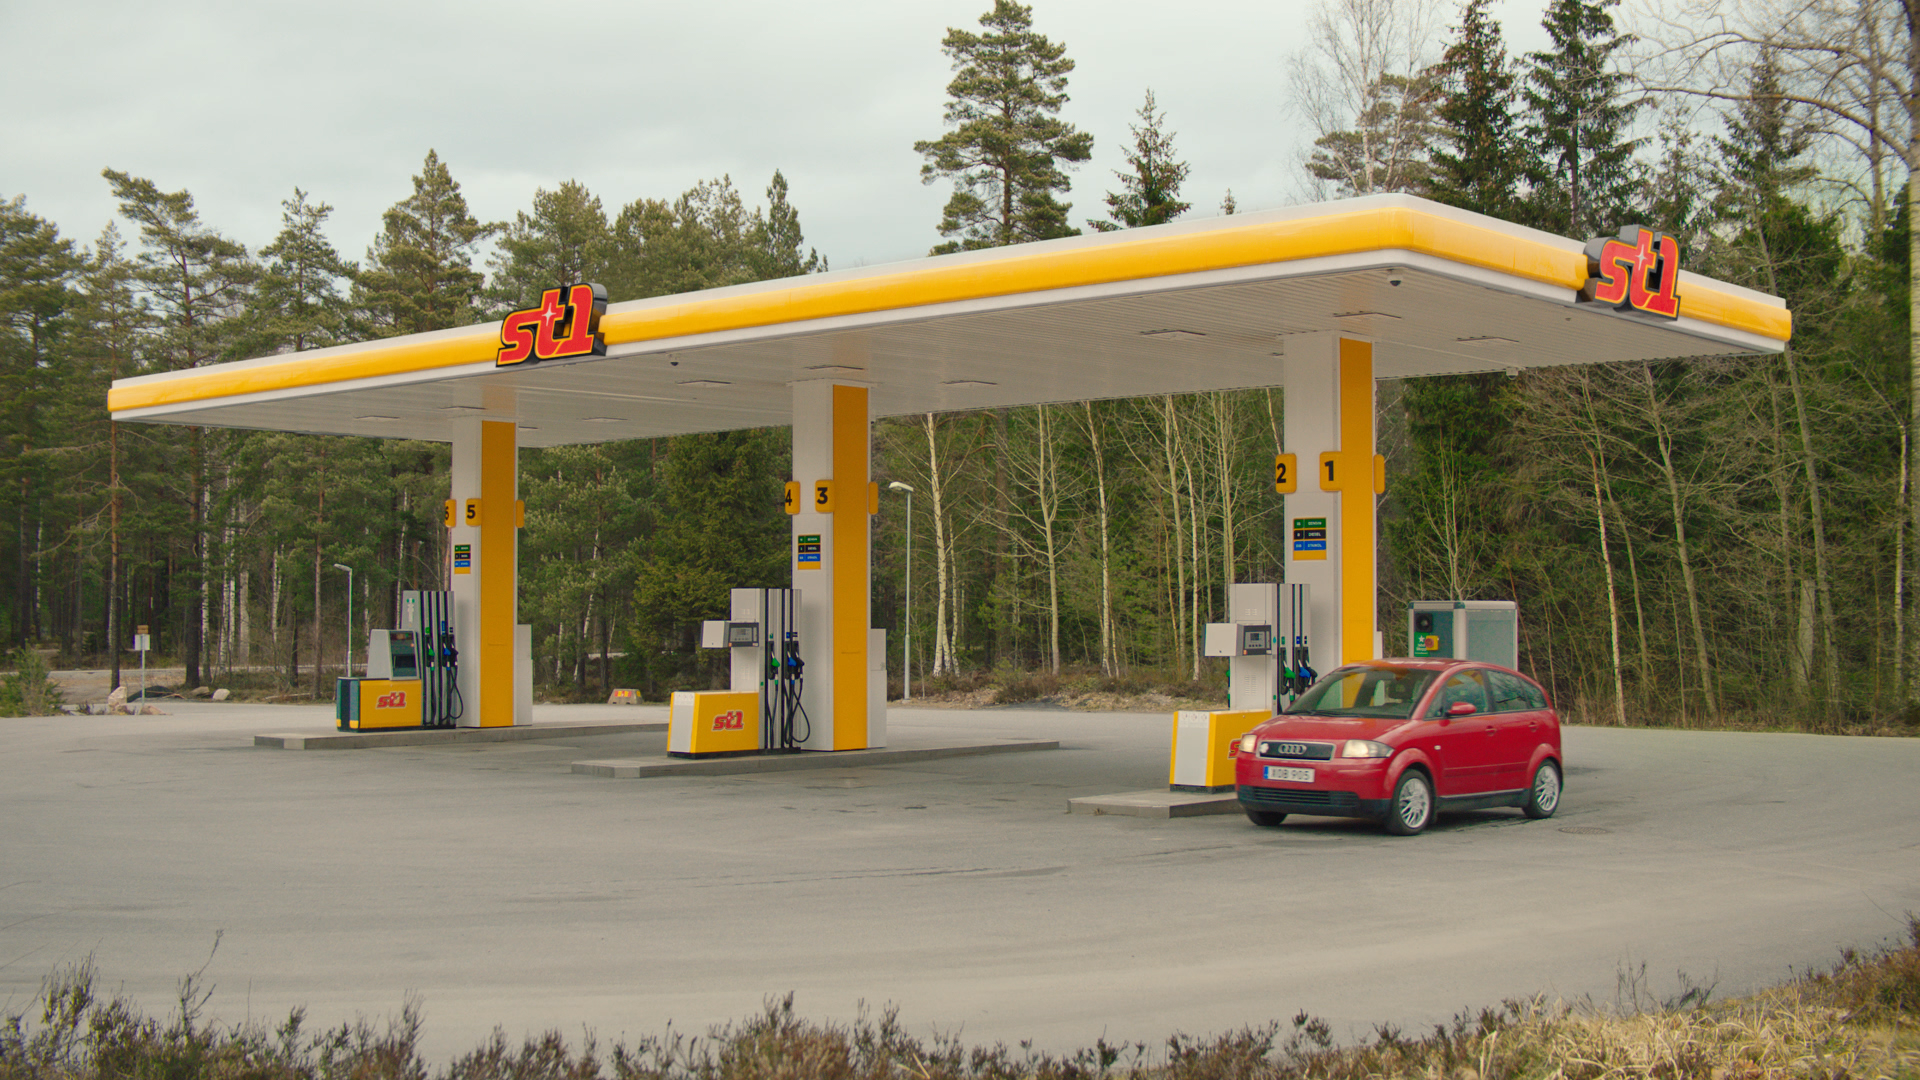 bensinstation